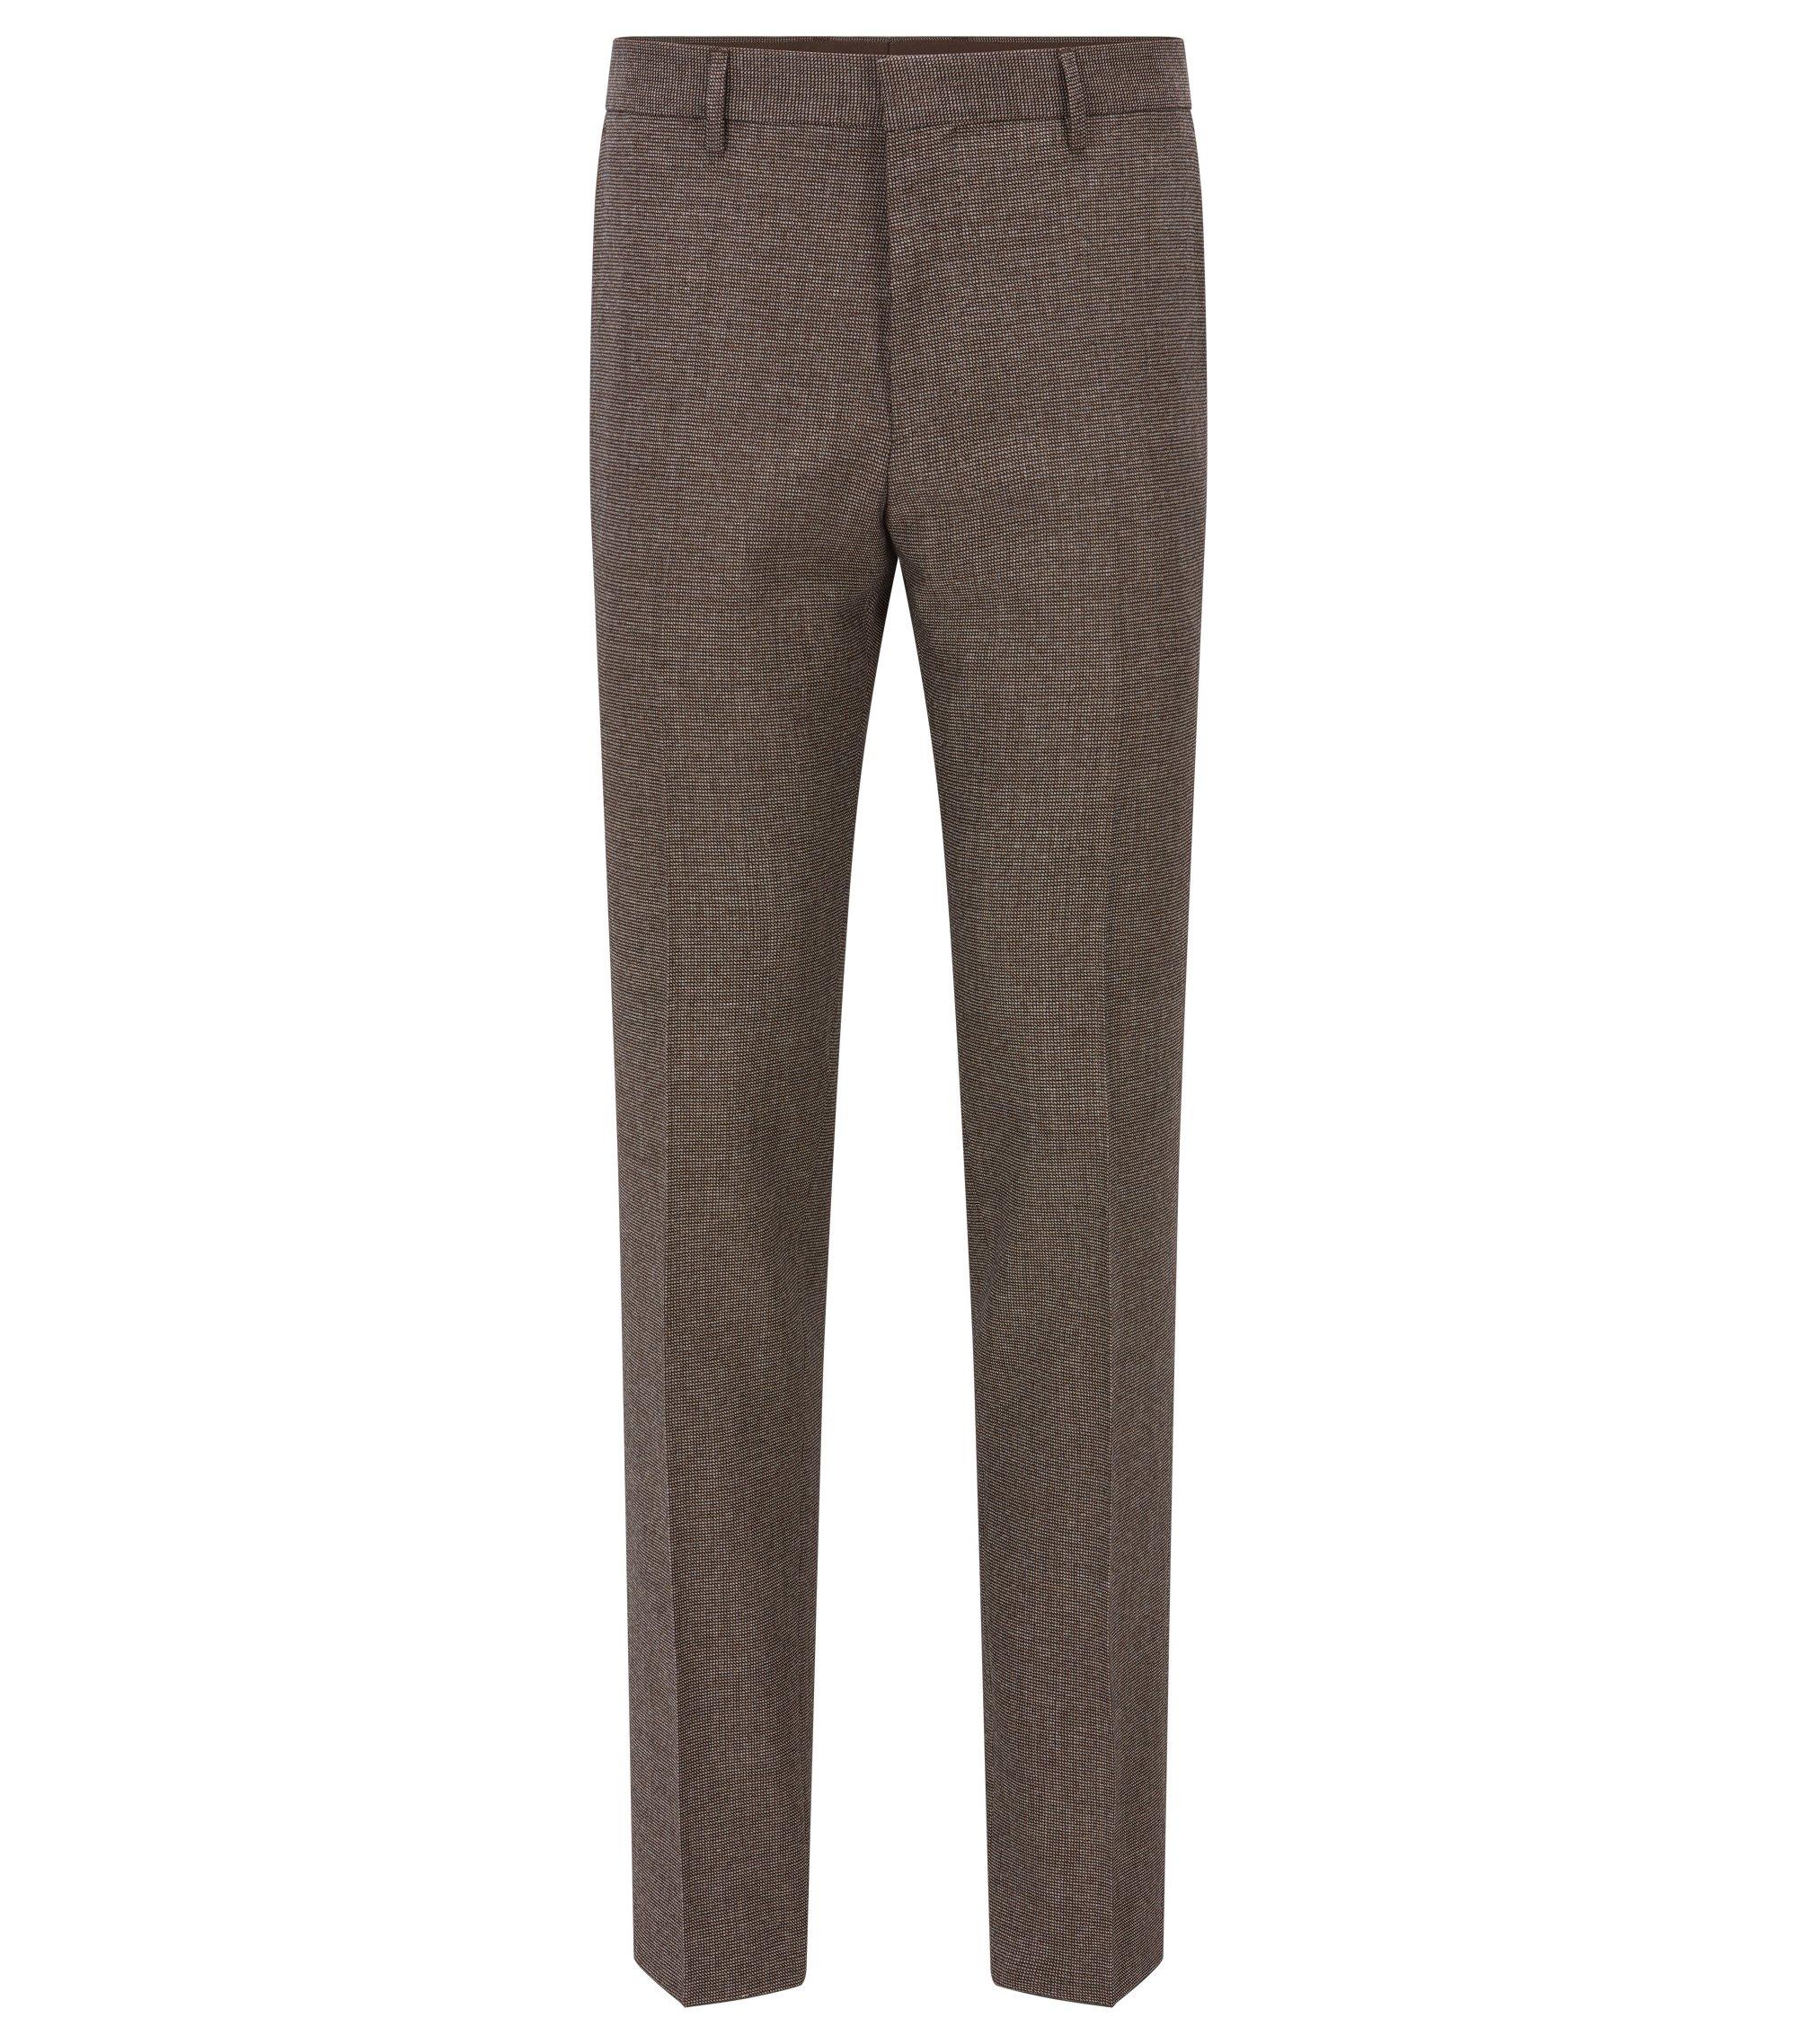 Nailhead Wool Cotton Dress Pants, Slim Fit | Giro, Khaki